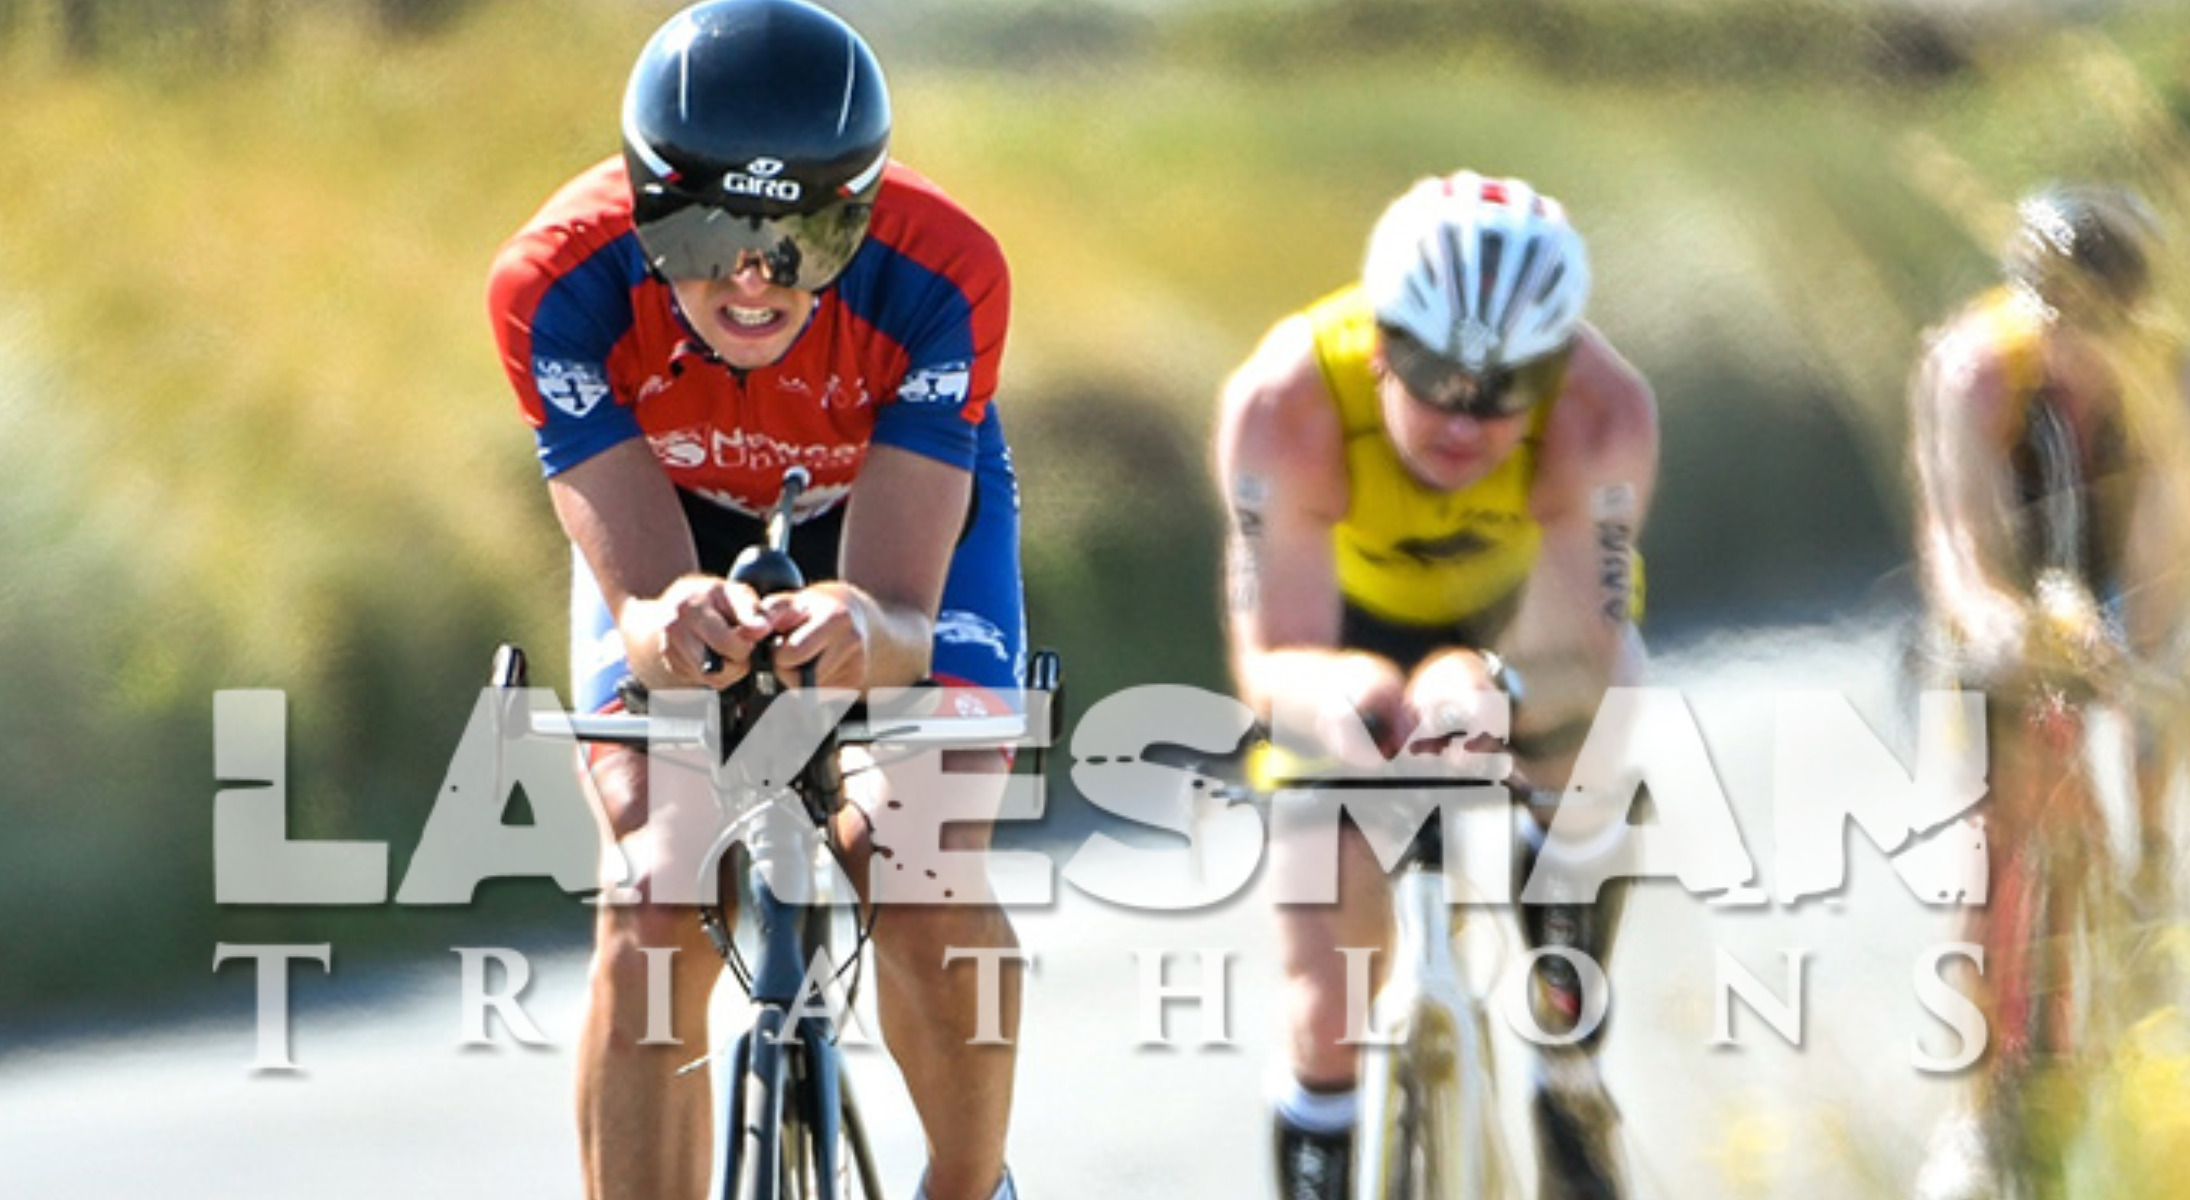 The Lakesman Triathlon - cover image